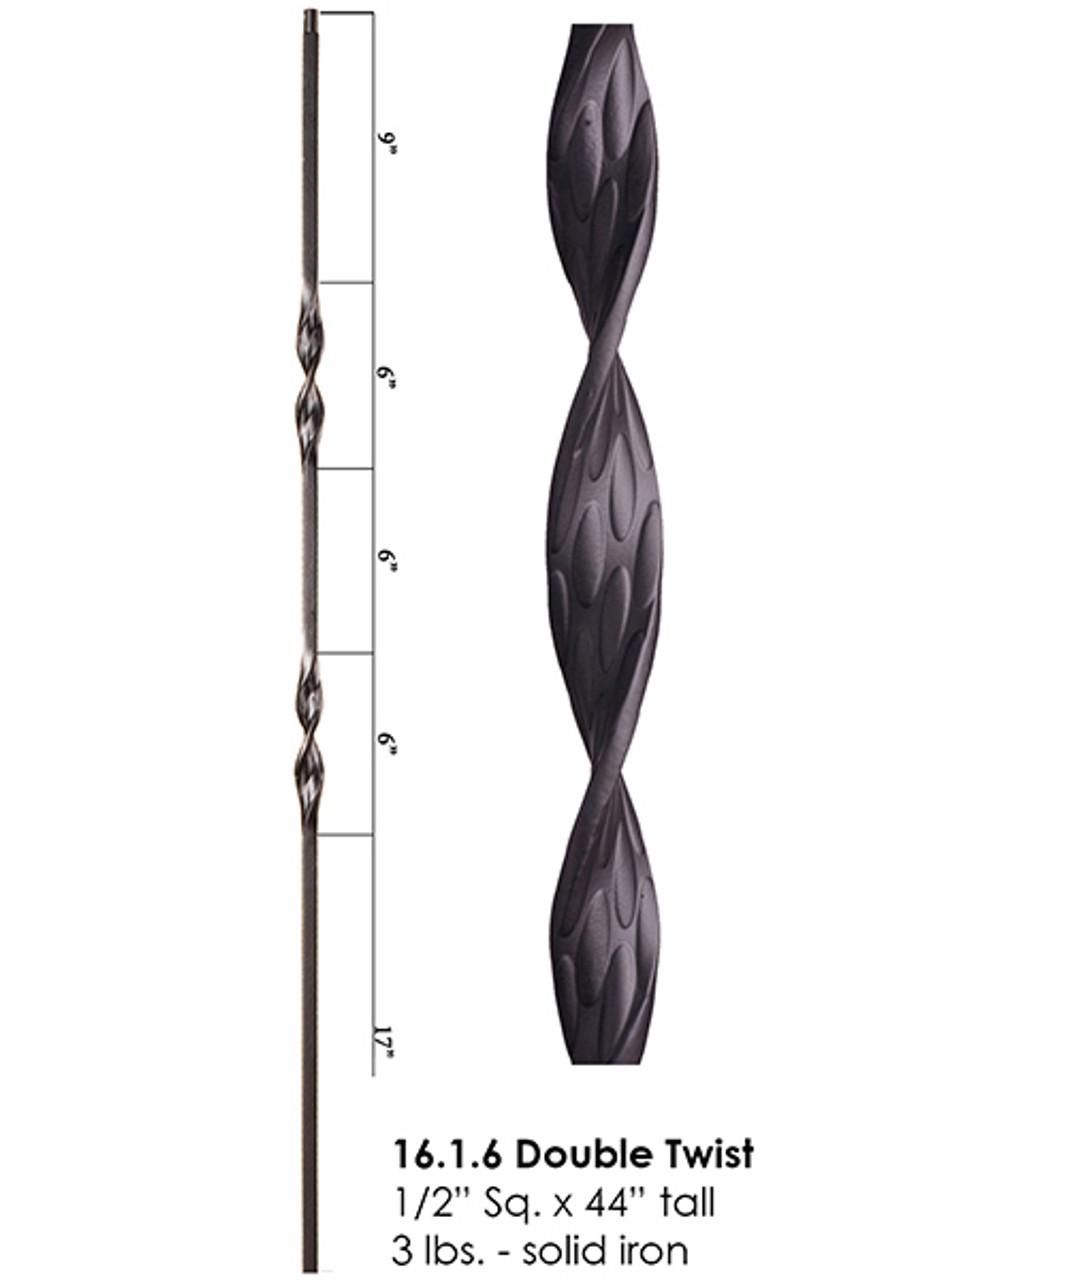 HF16.1.6 Double Ribbon Iron Baluster